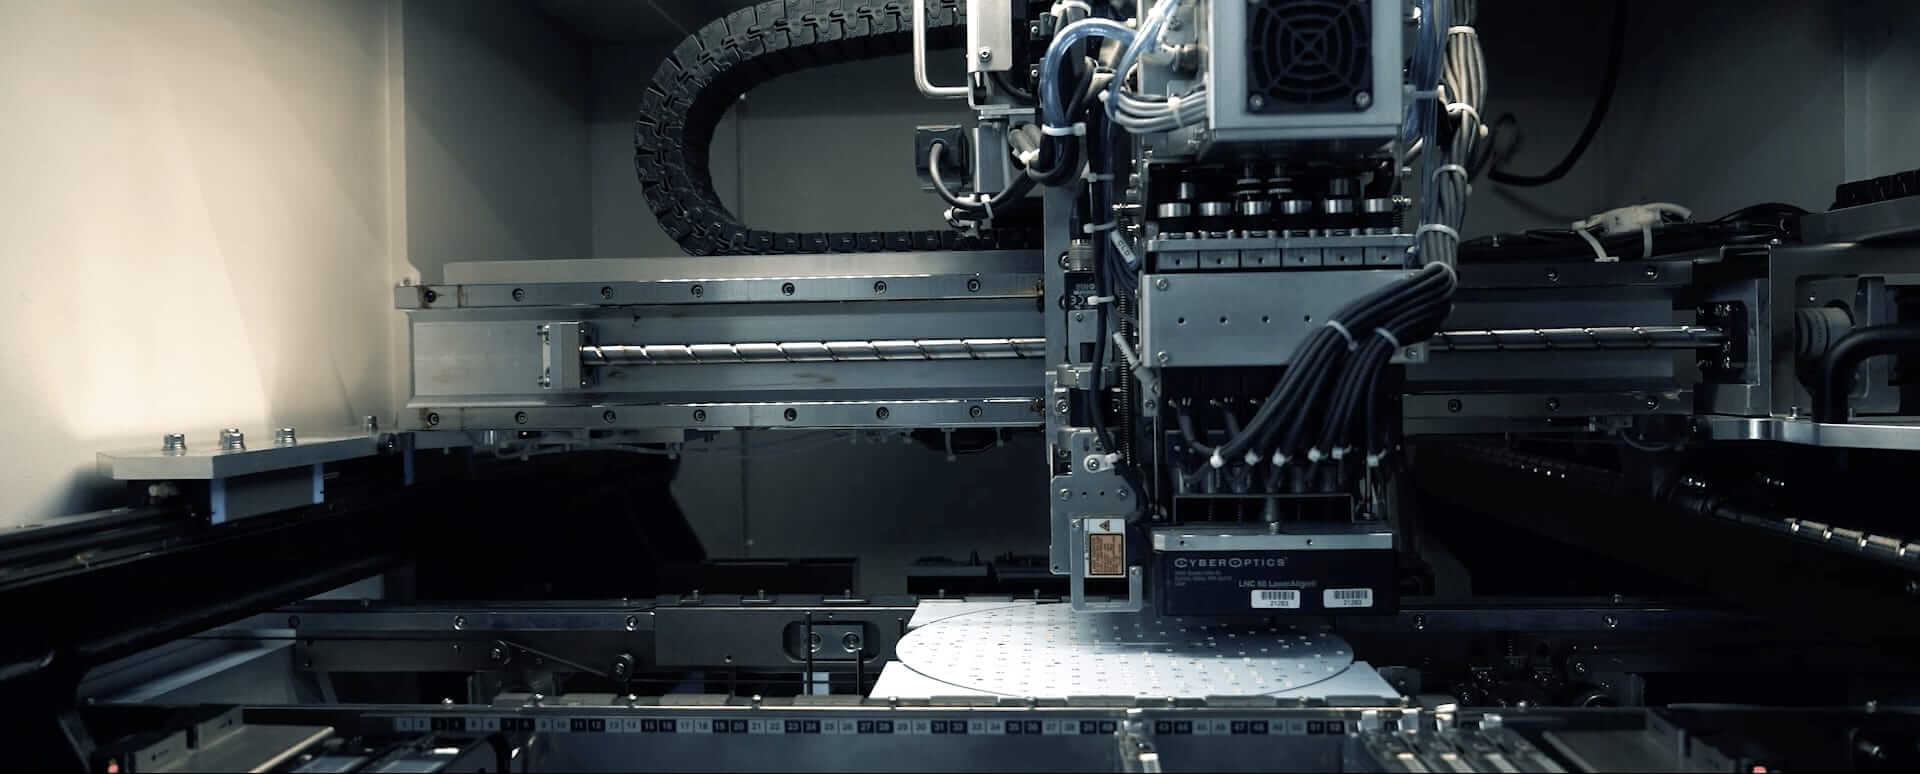 Production of quality LED luminaires